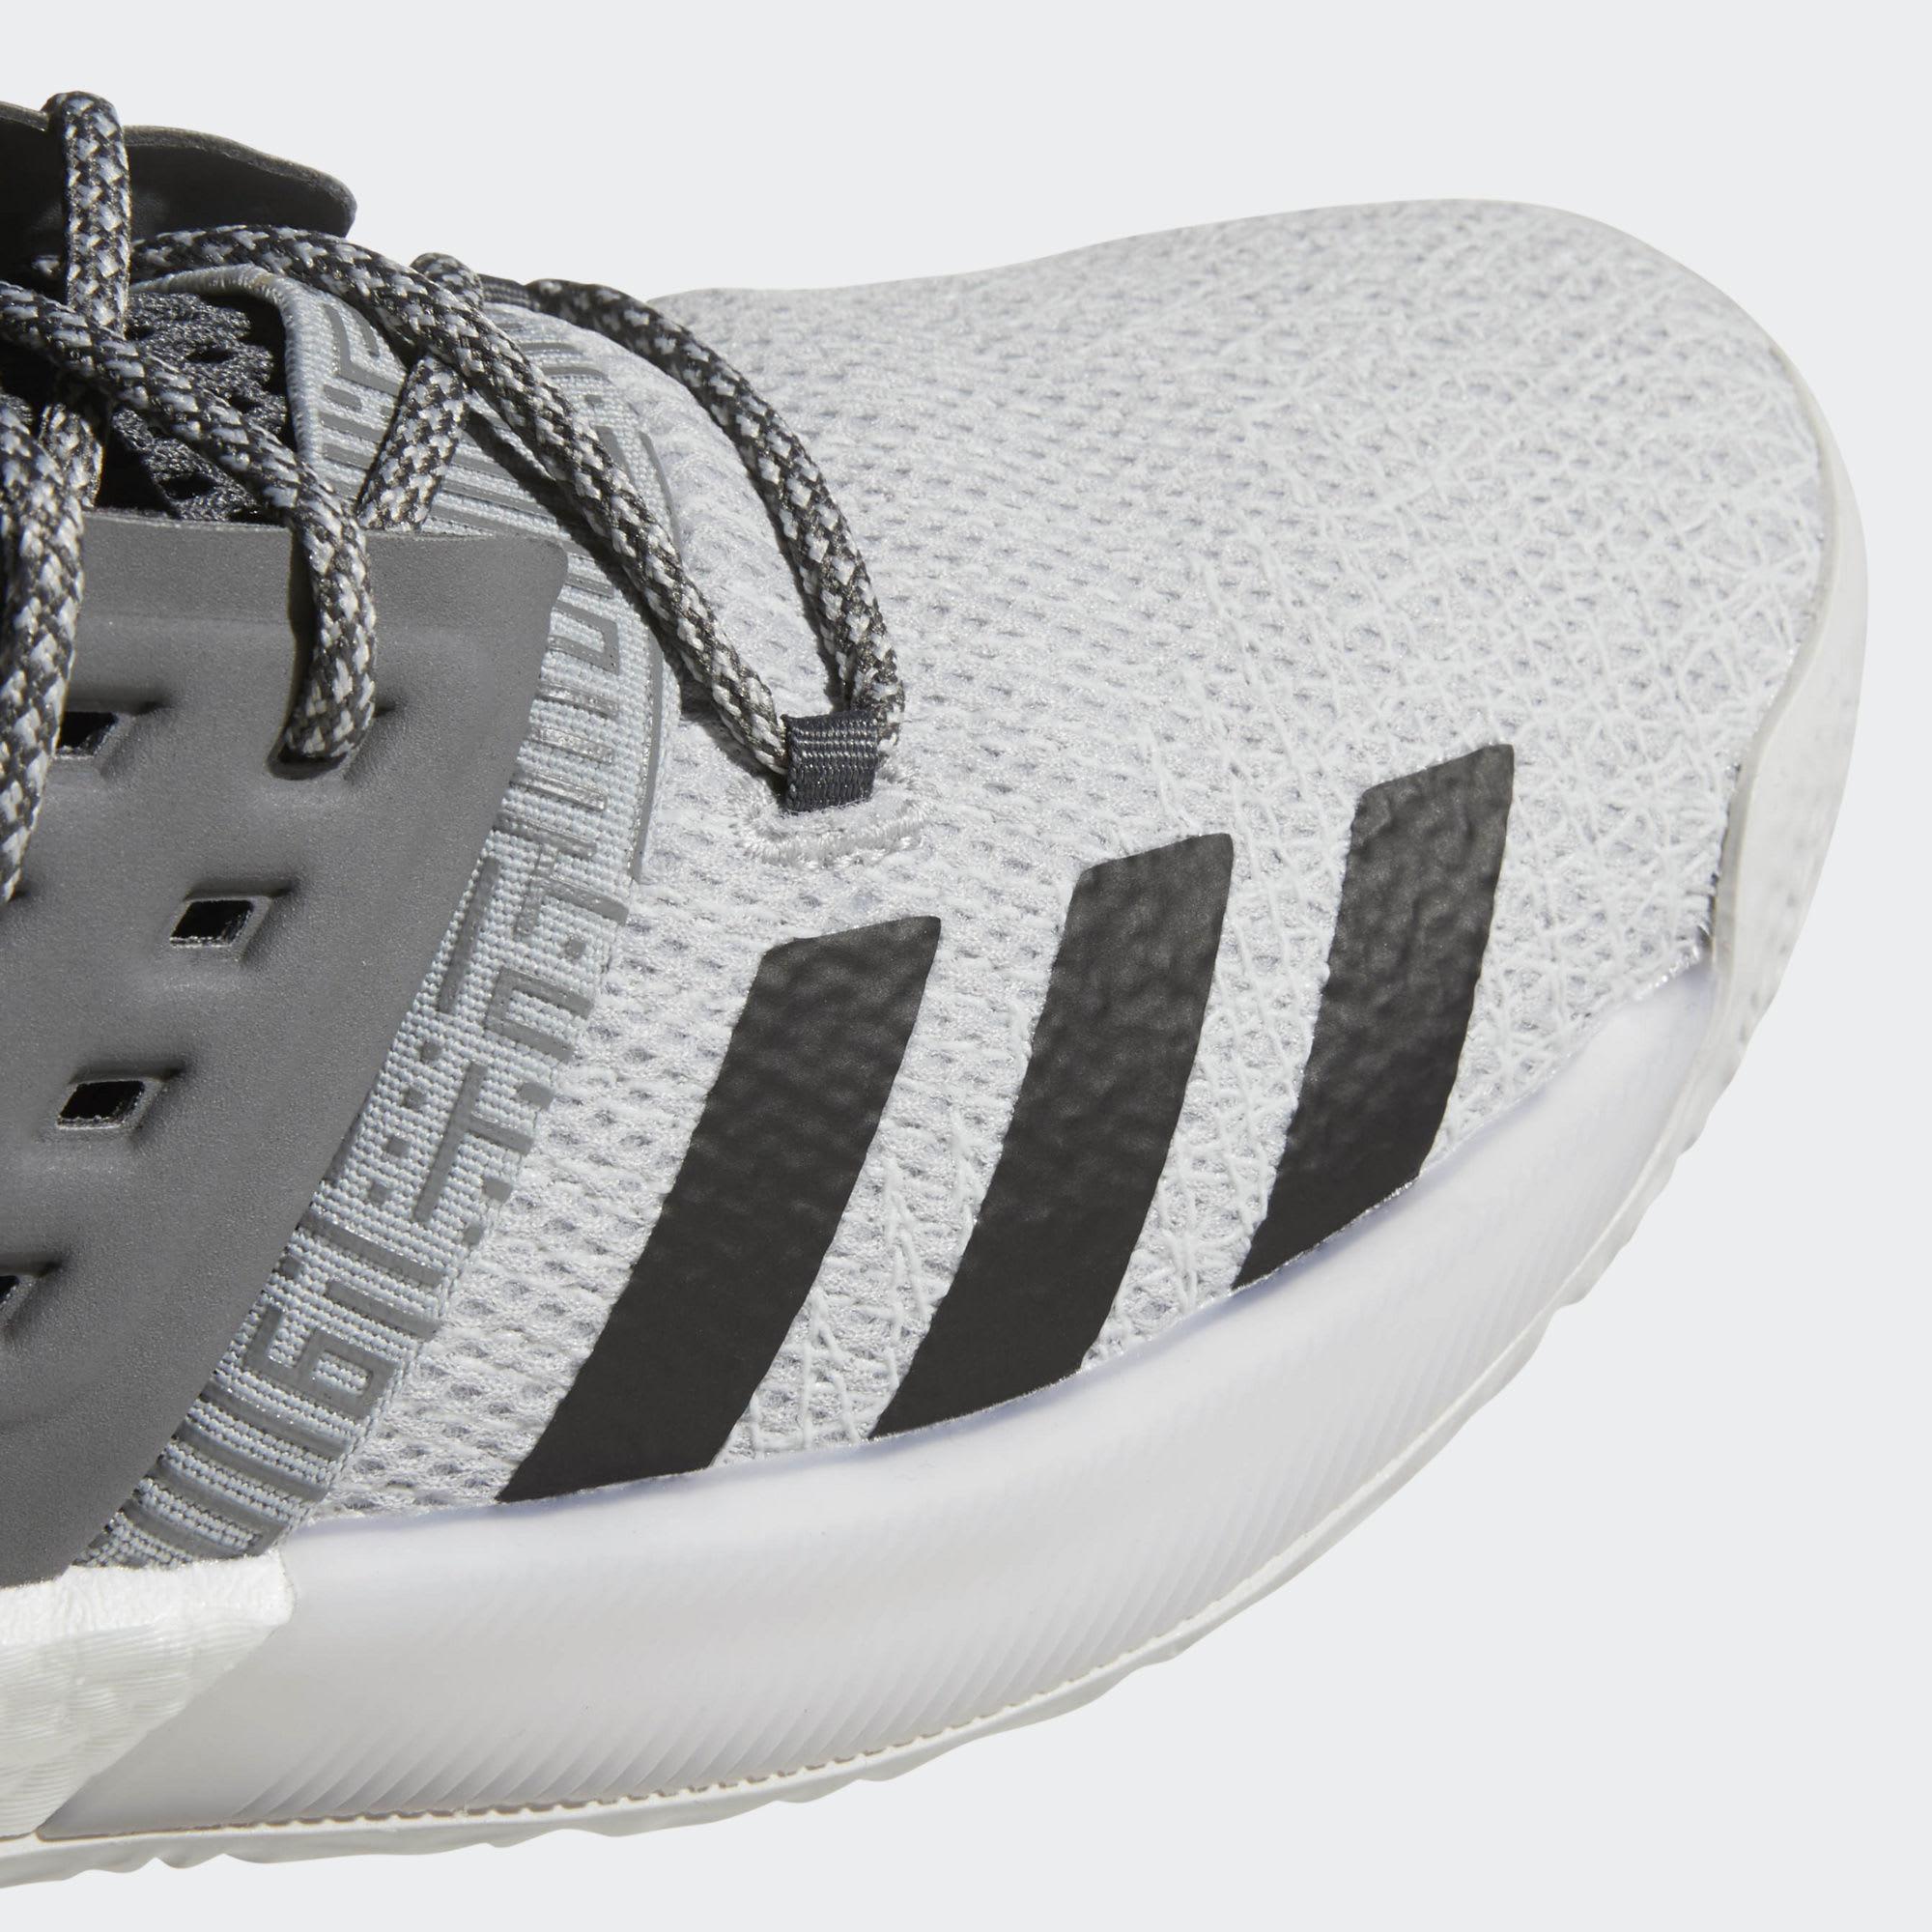 Adidas Harden Vol. 2 Concrete Grey Release Date AH2122 Toe